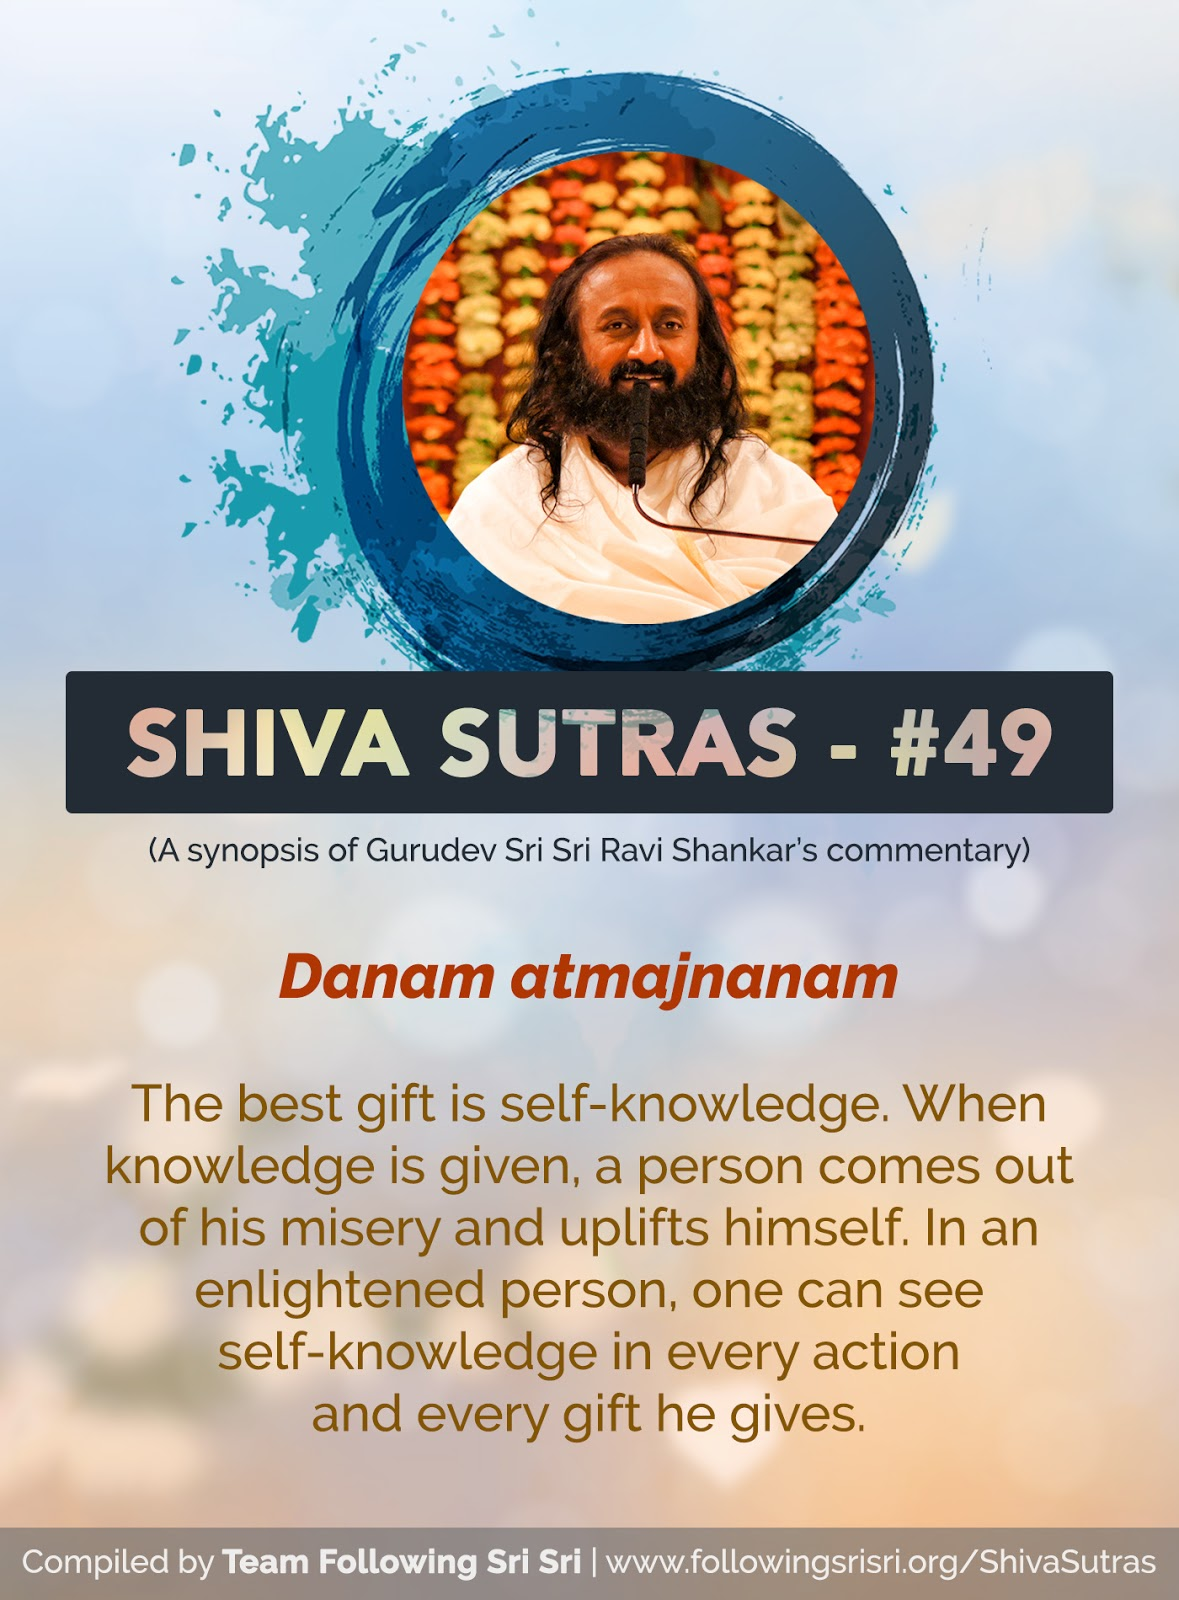 Shiva Sutras - Sutra 49